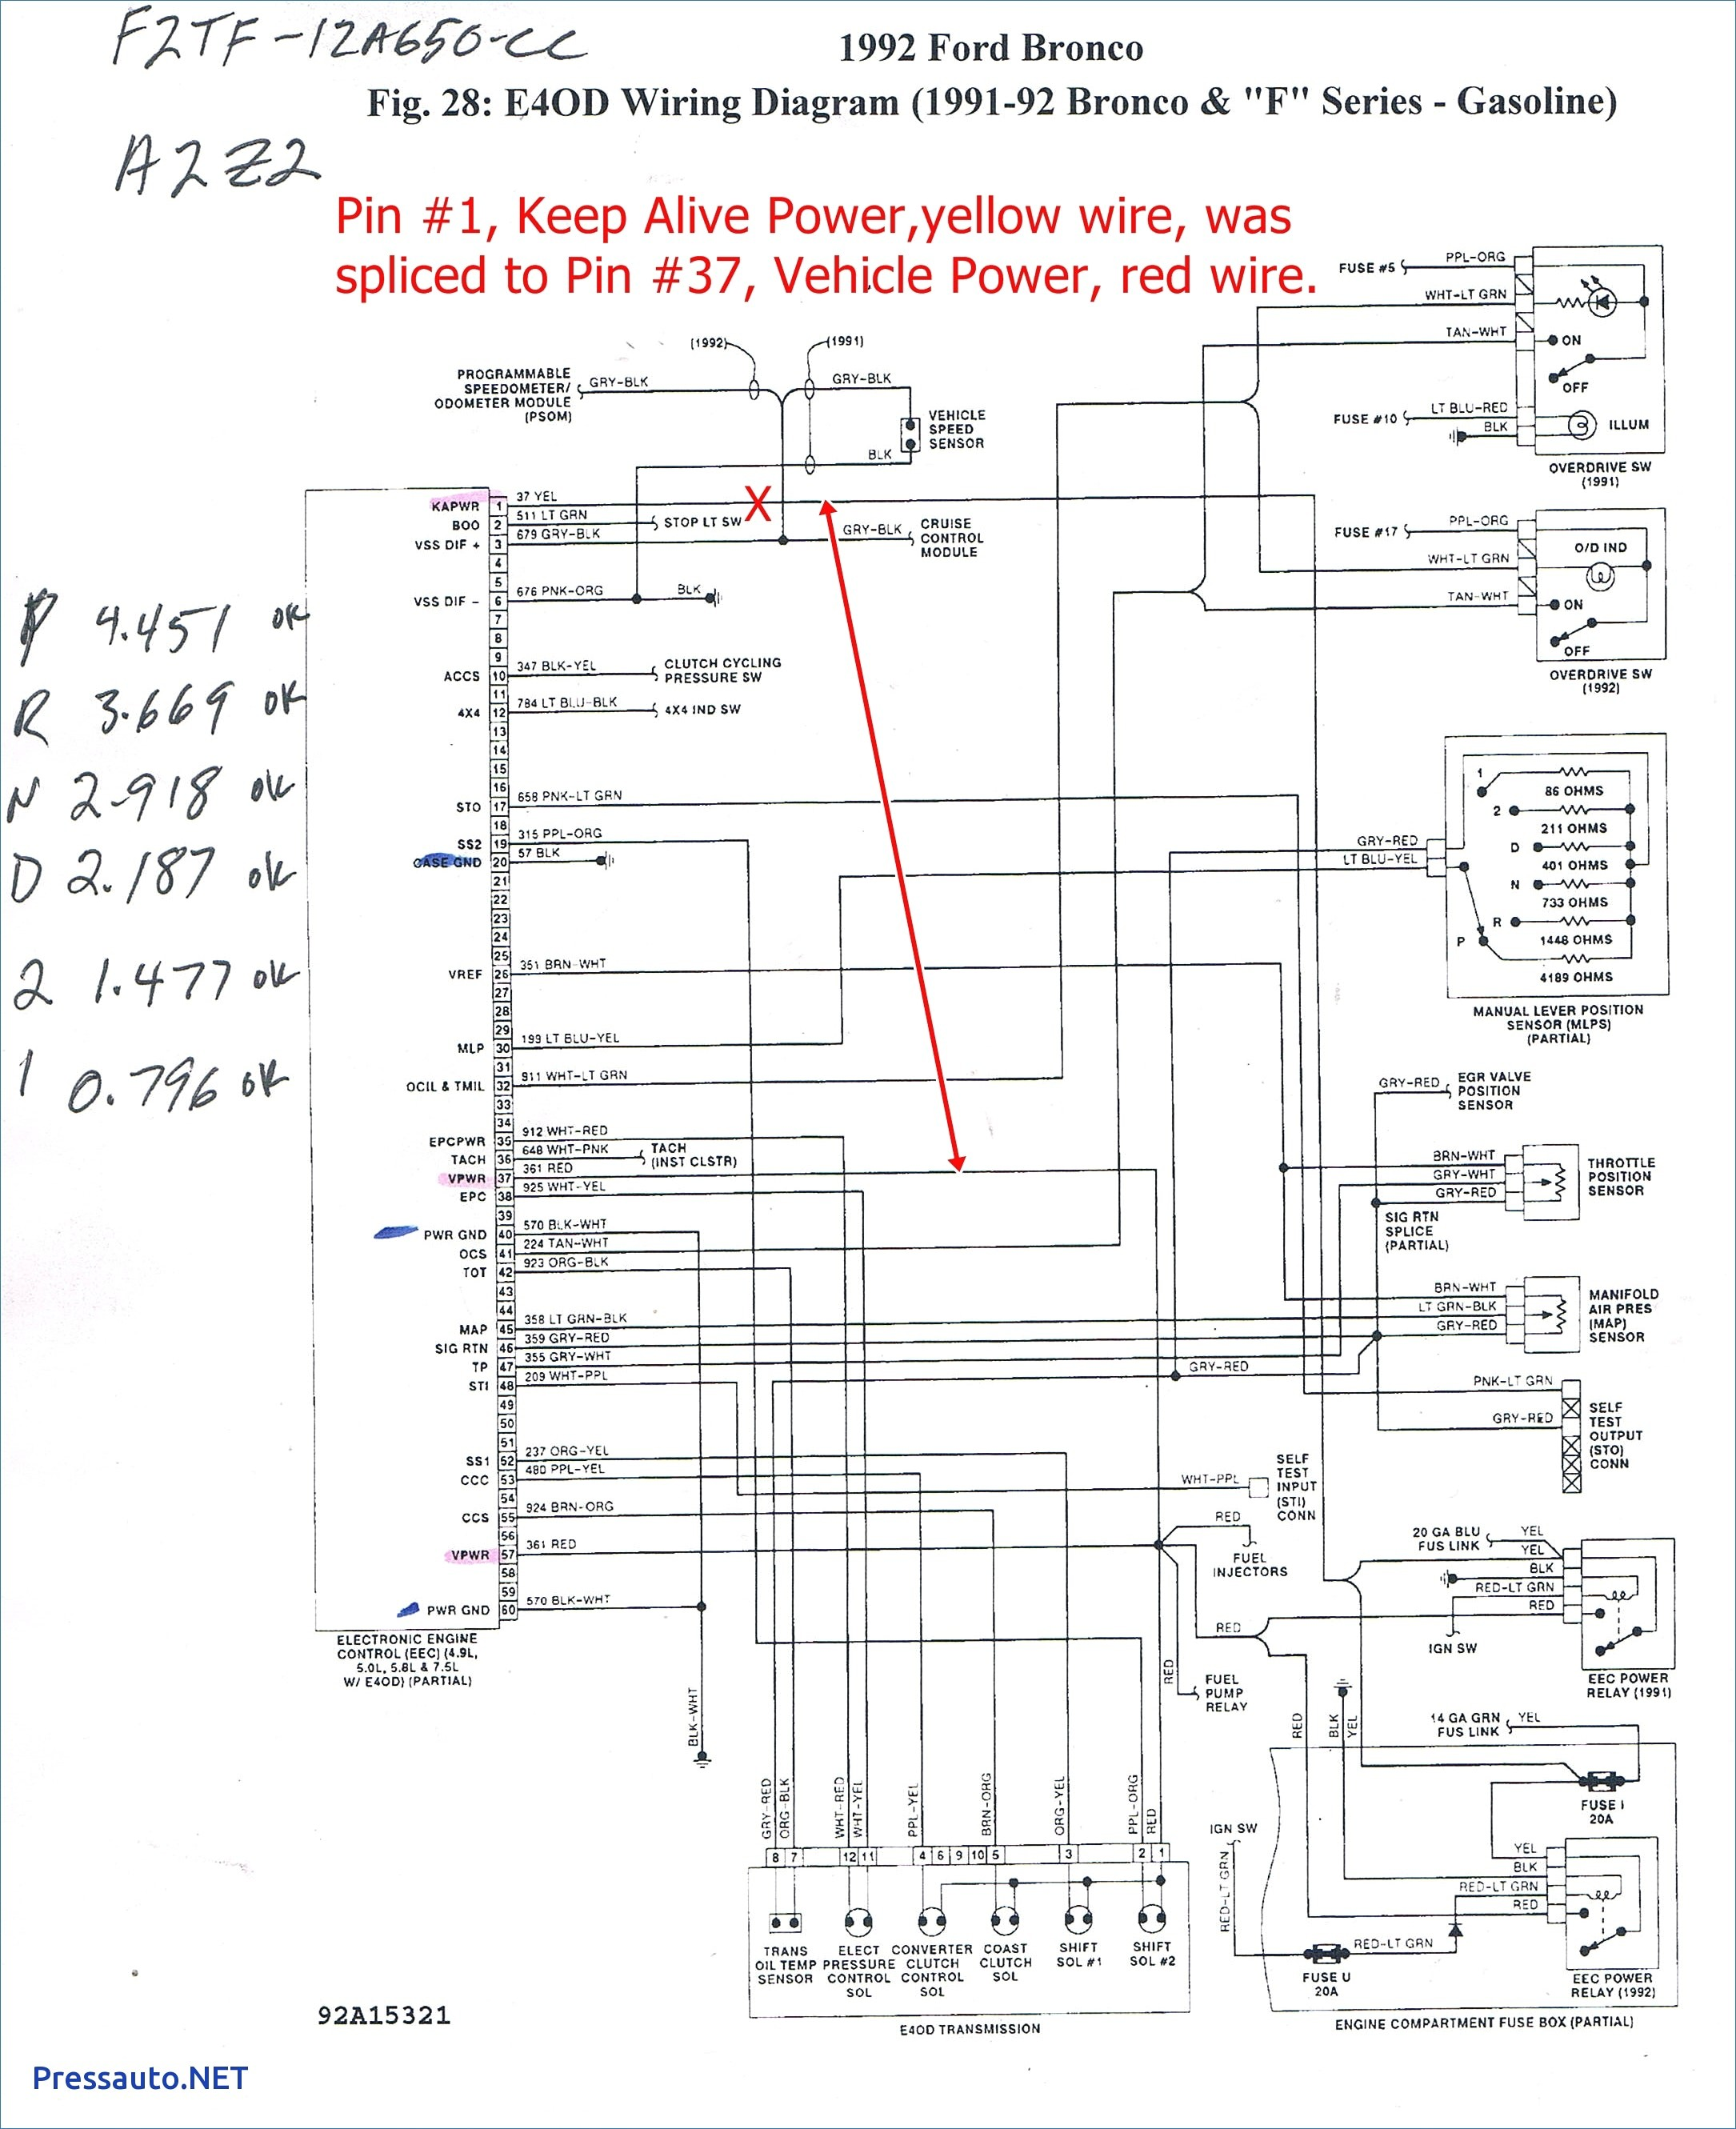 2002 Ford Taurus Power Window Wiring Diagram Database